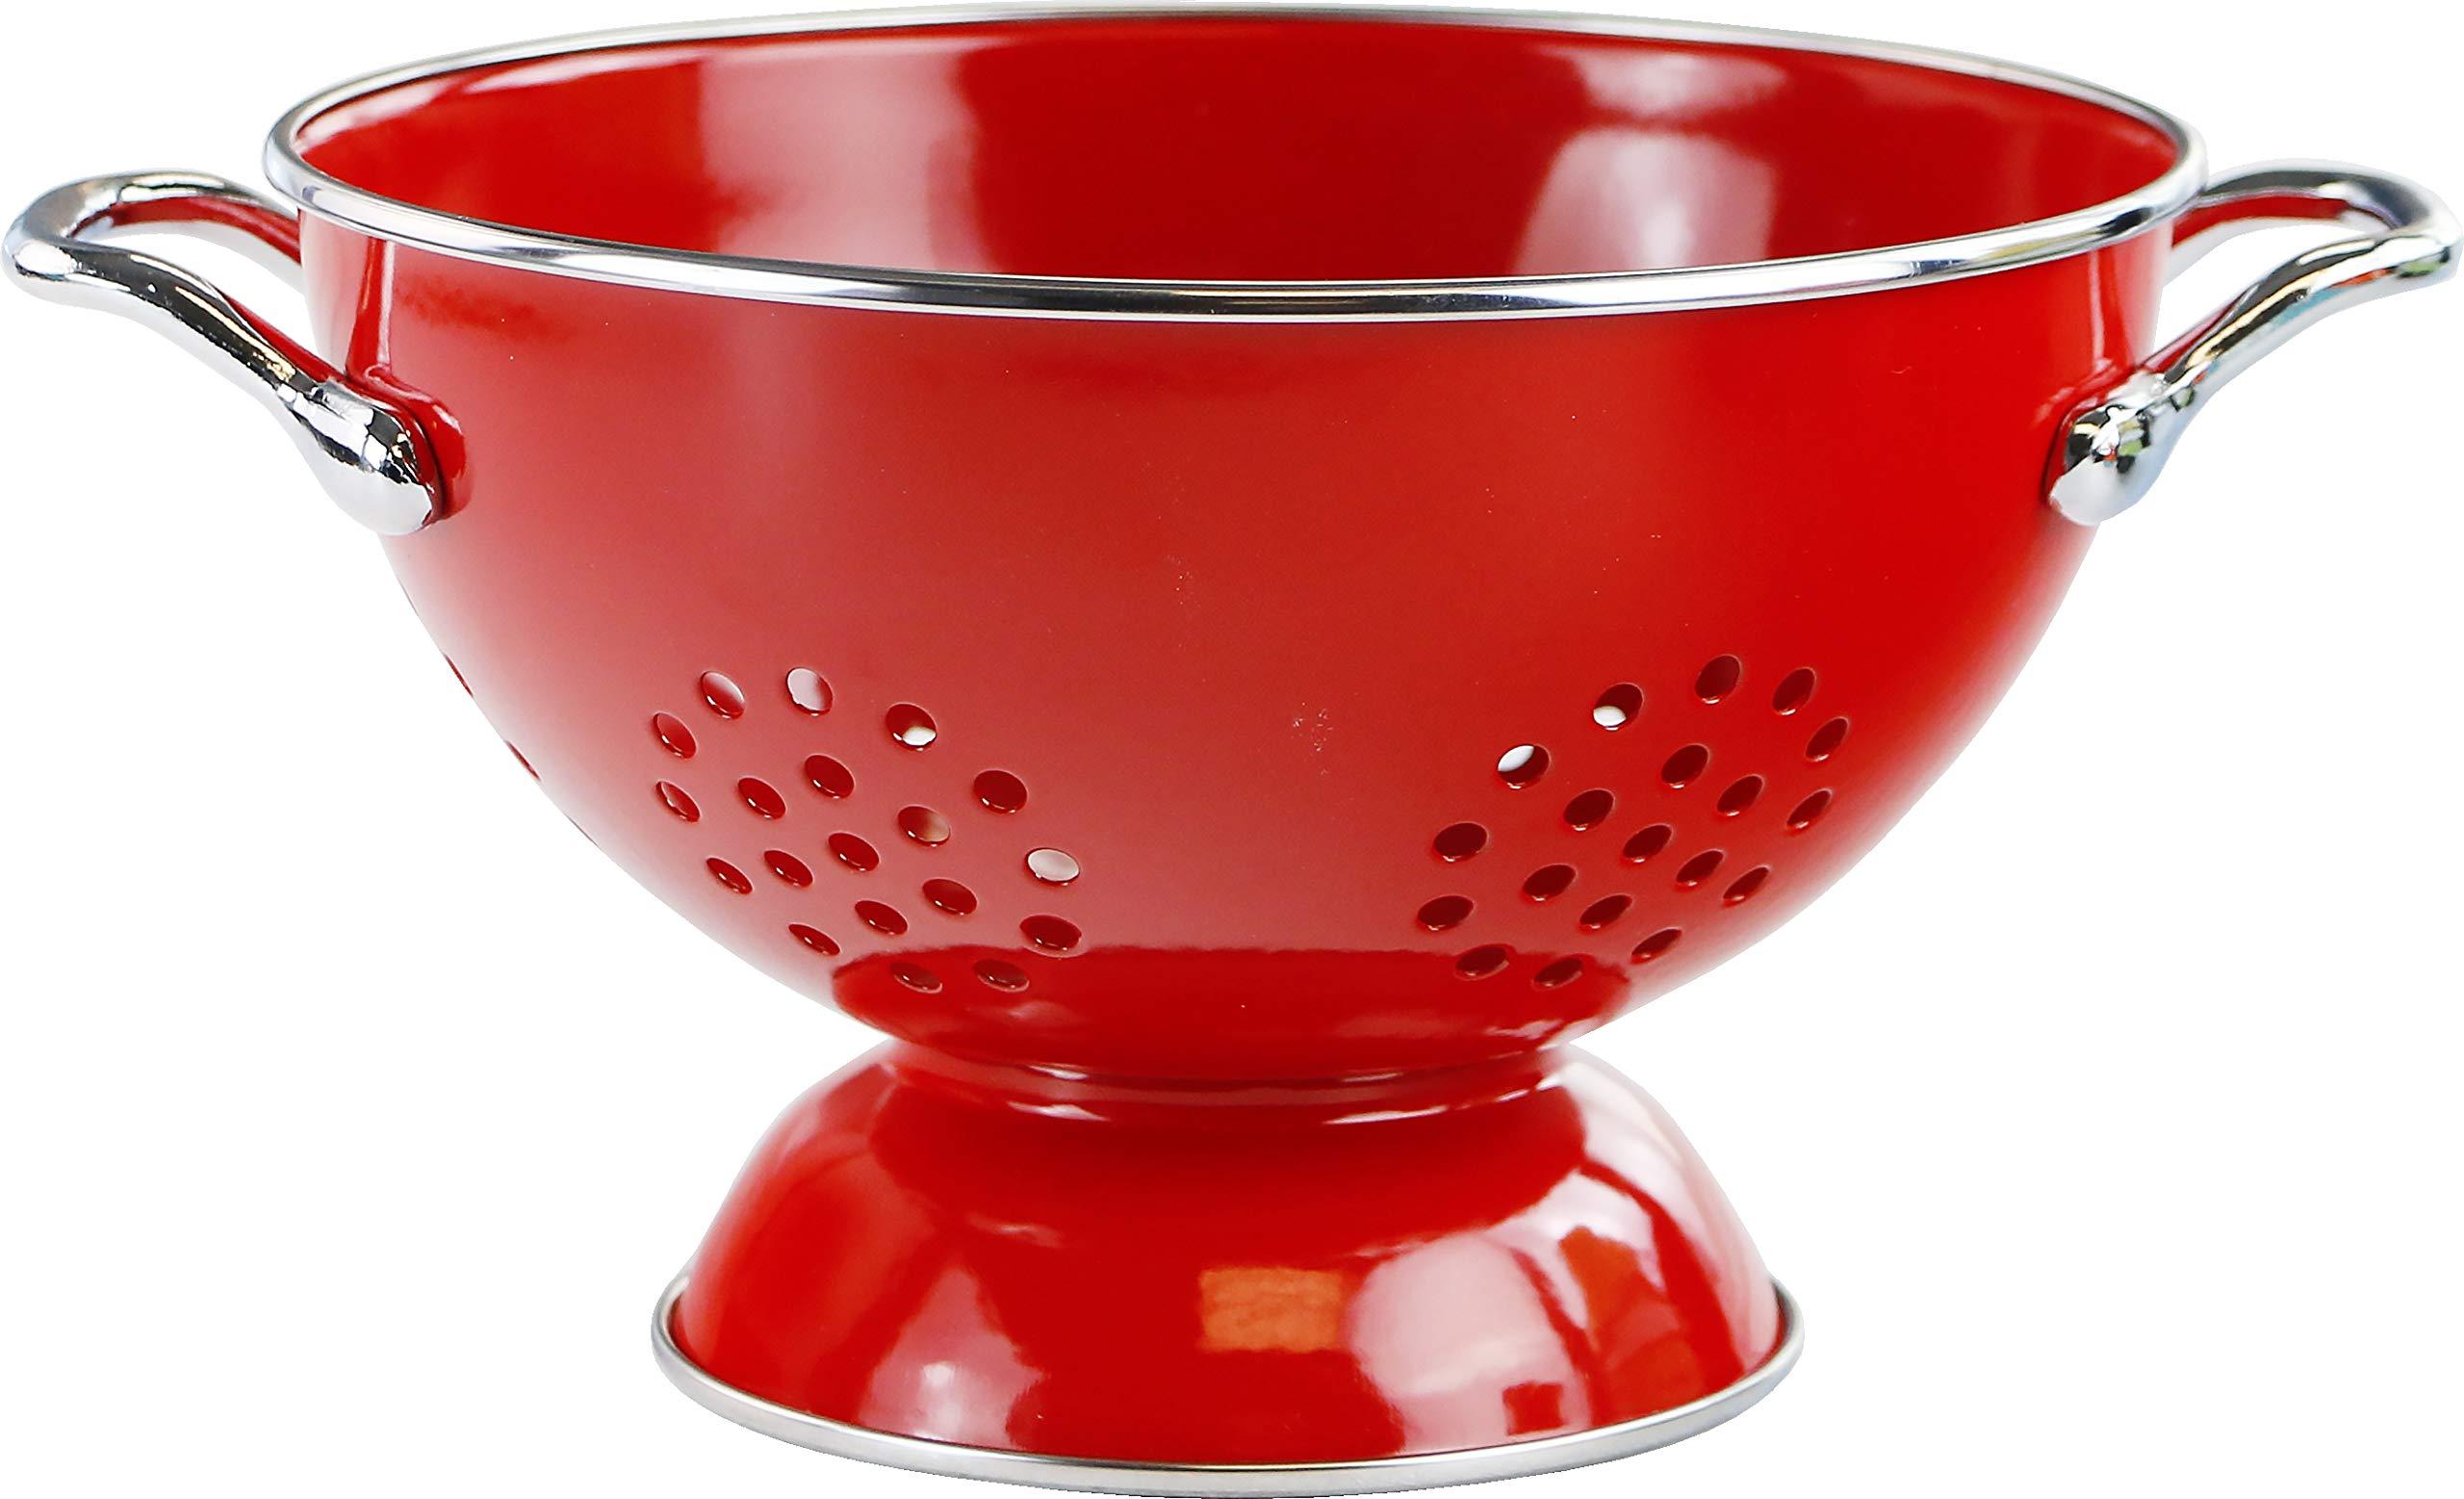 Calypso Basics by Reston Lloyd Powder Coated Enameled Colander, 1.5 Quart, Red